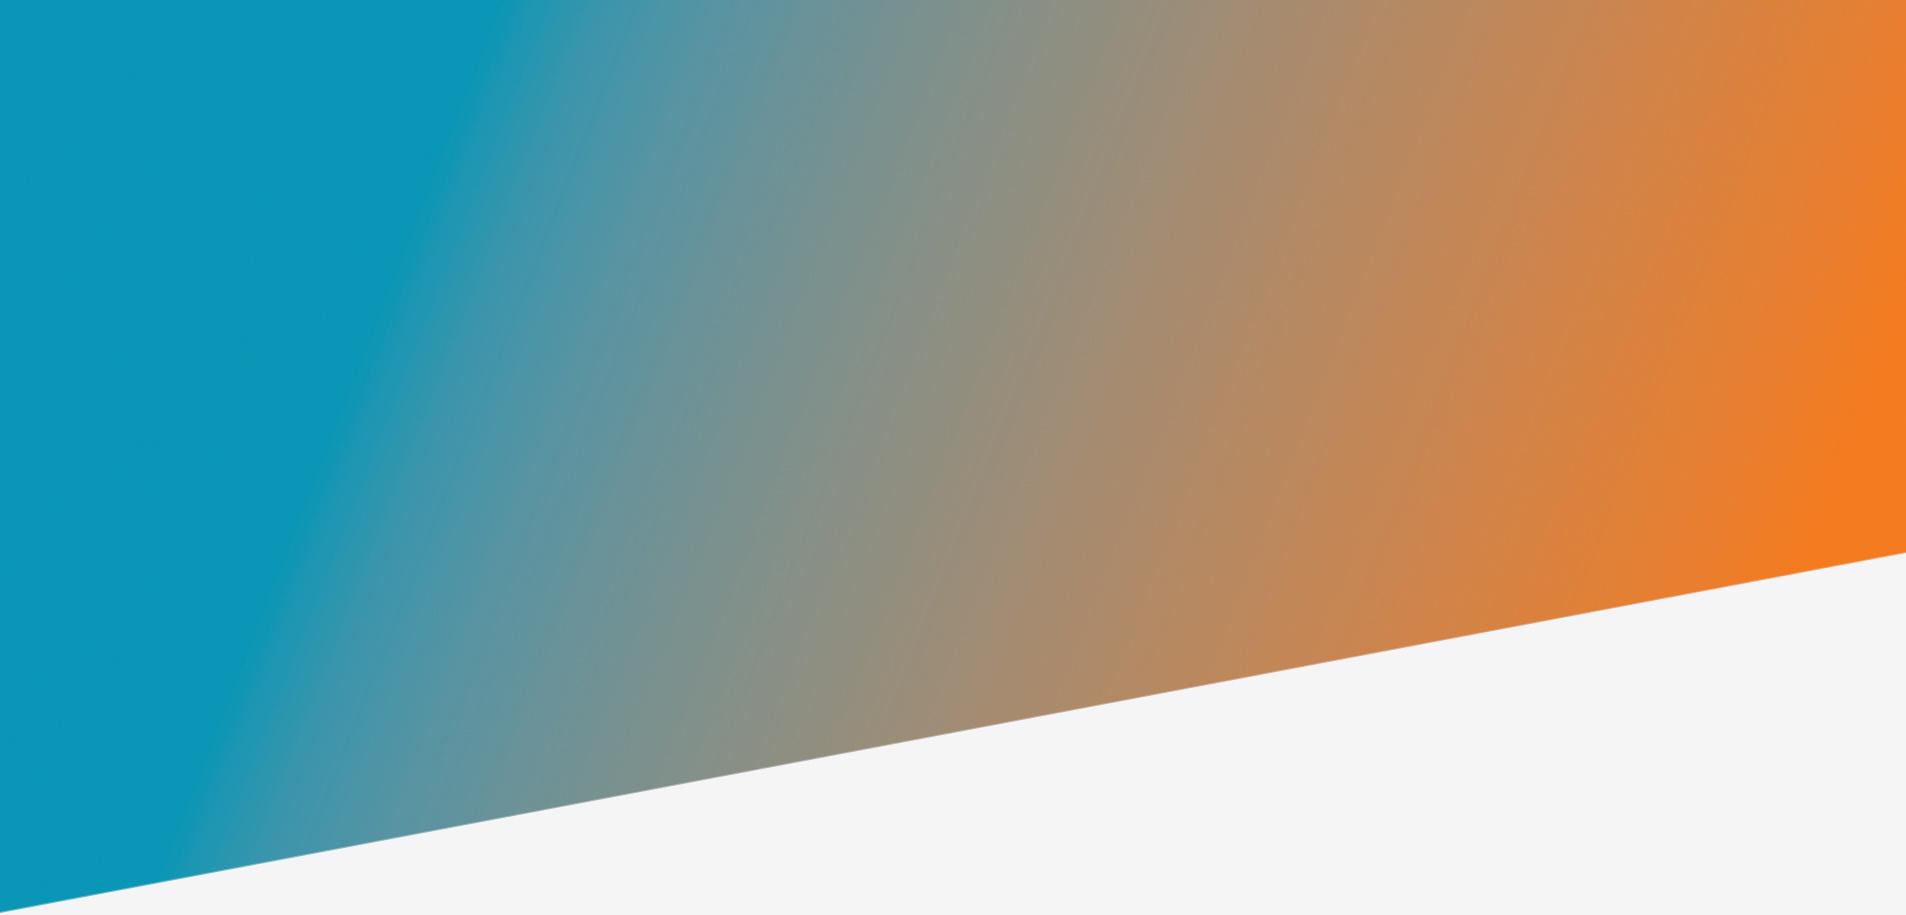 cognidox-blog-background.png